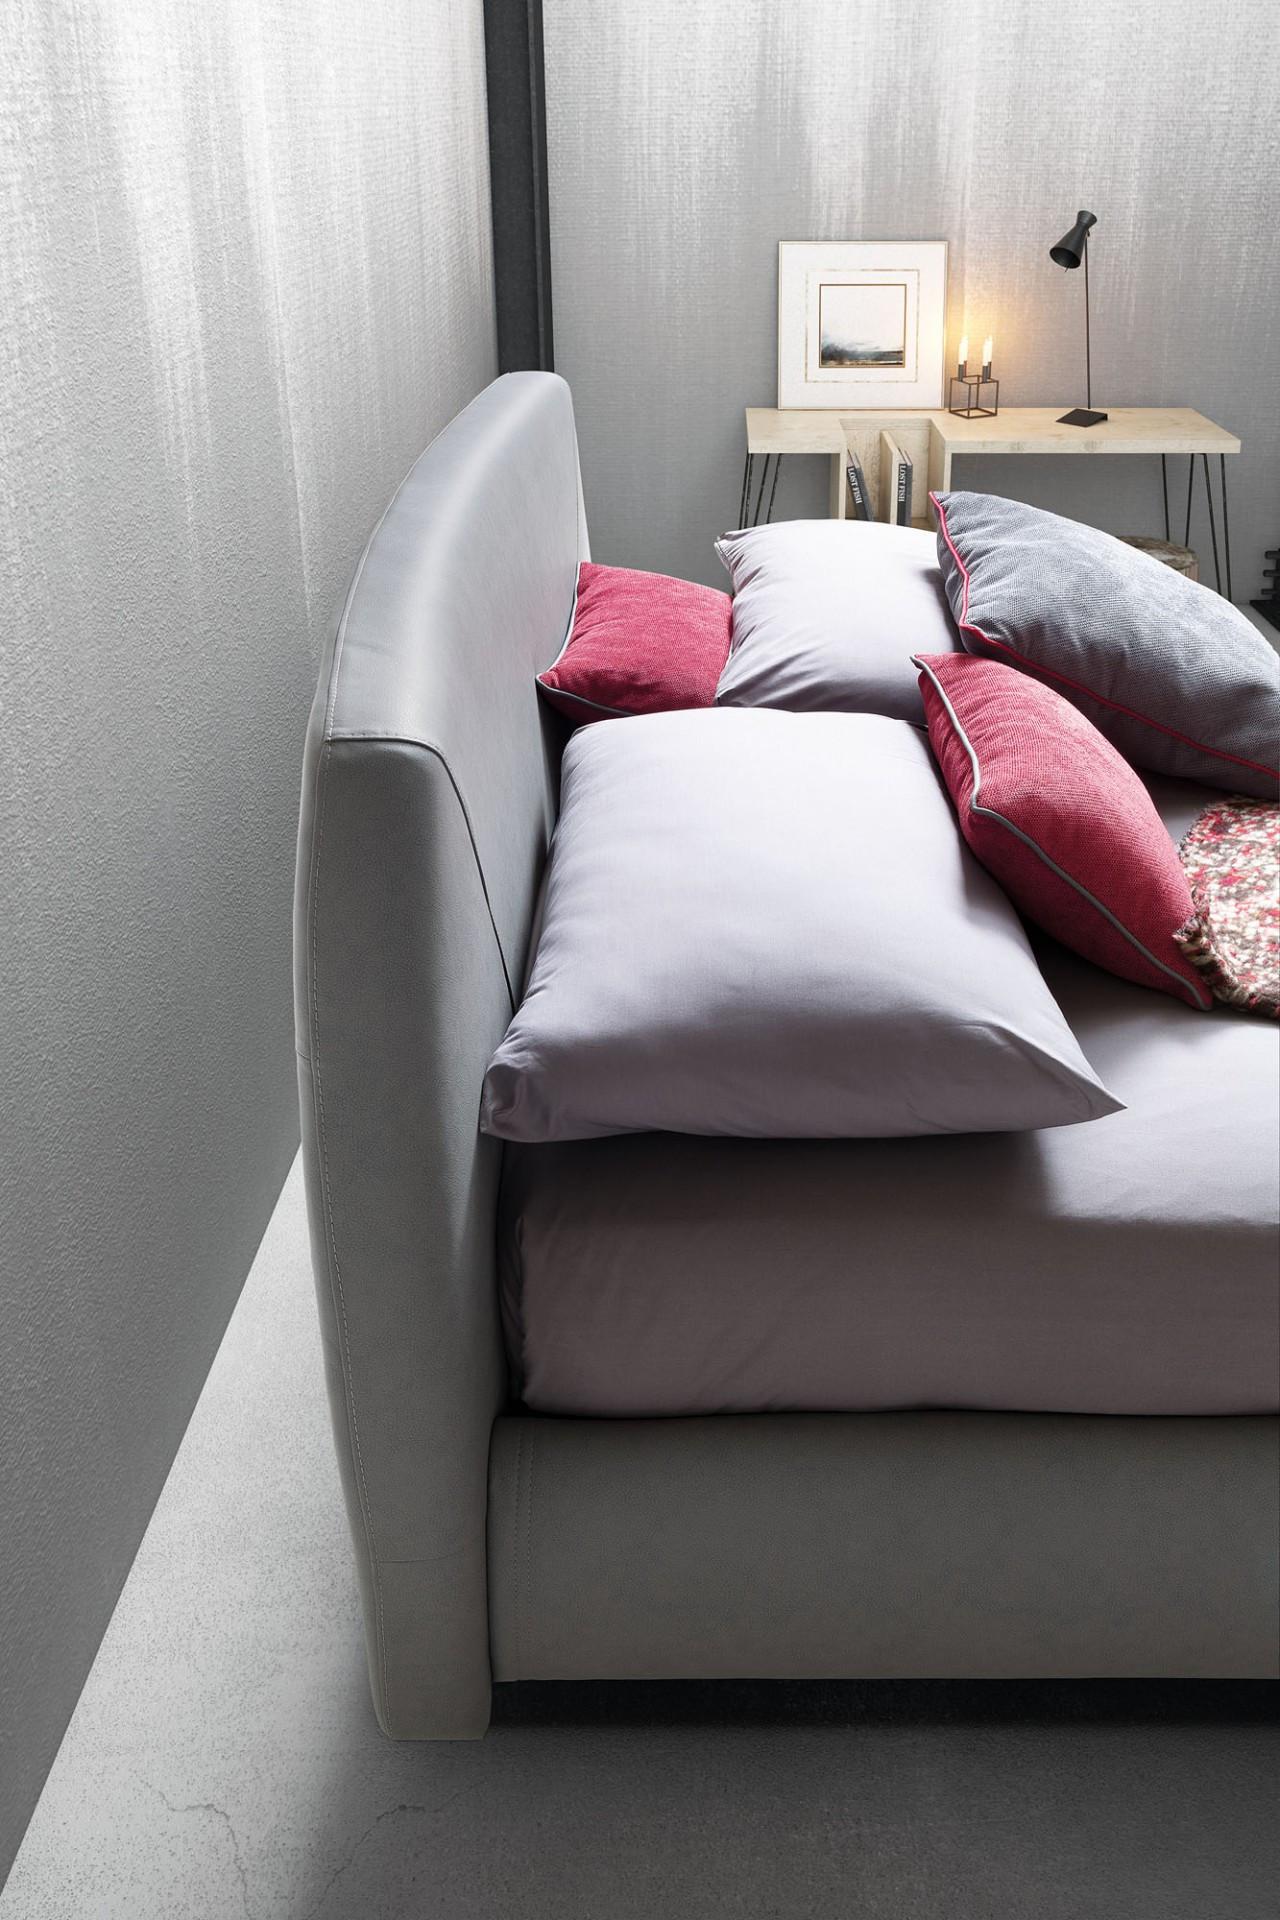 Beds Belmondo Lecomfort